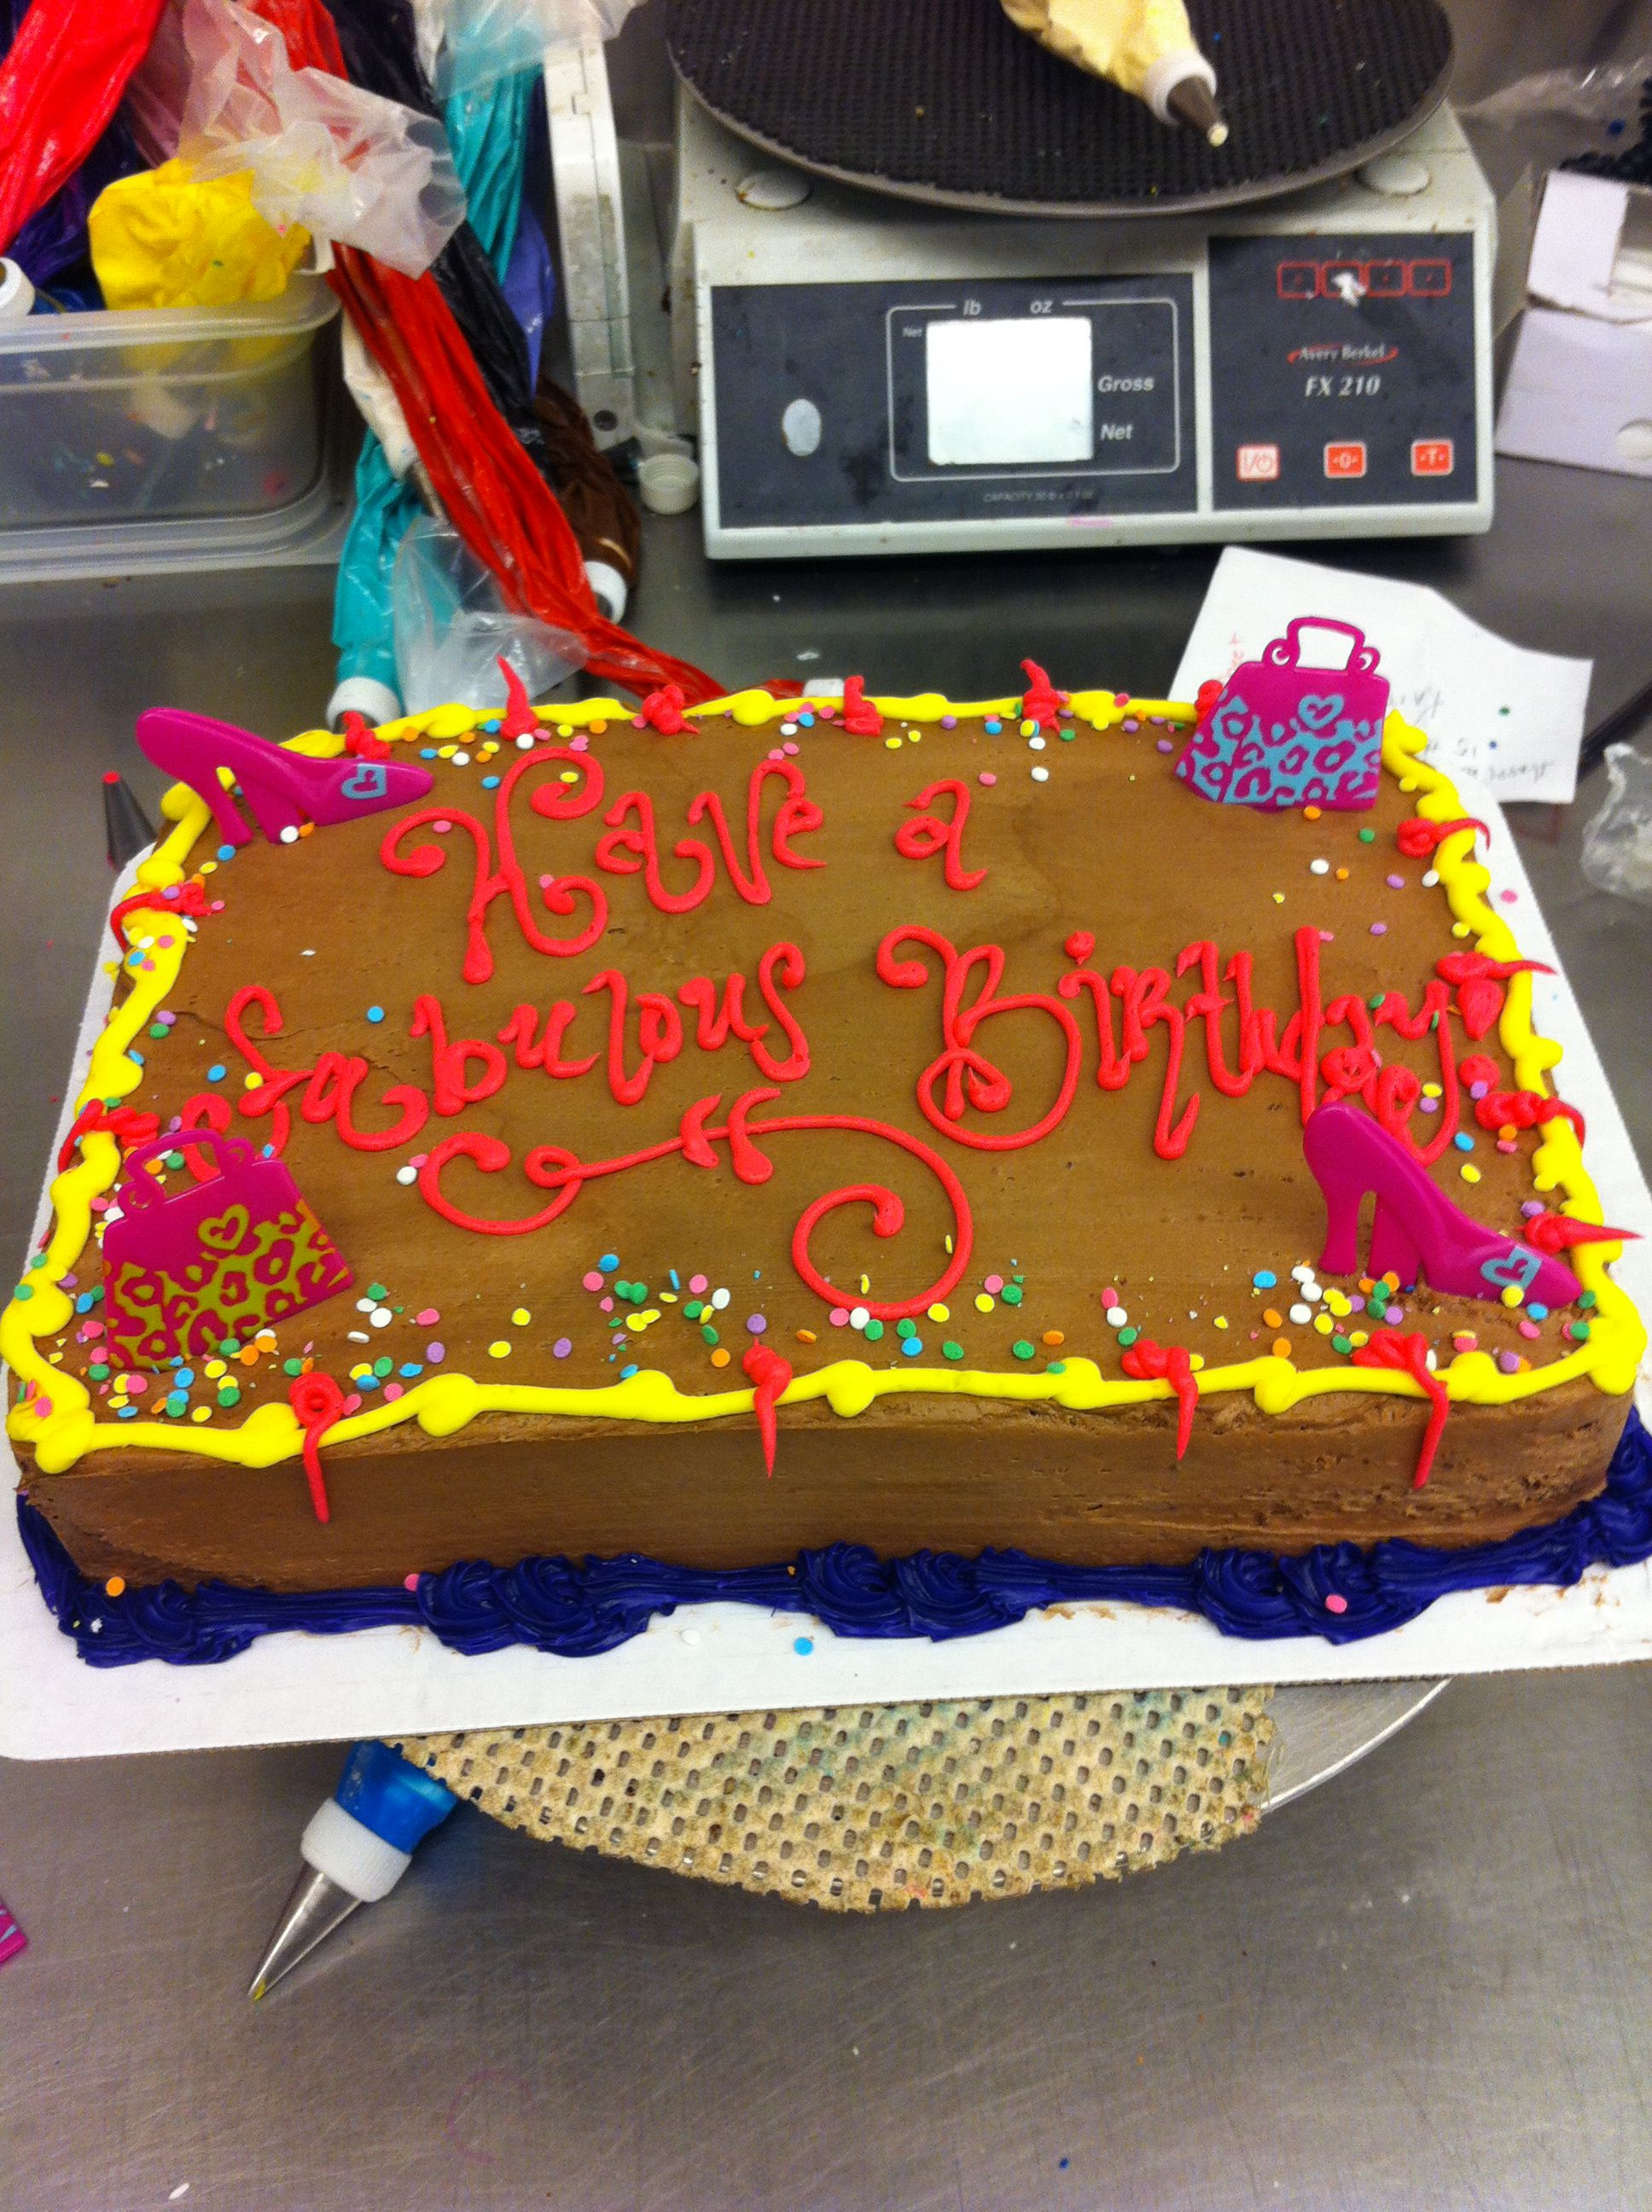 Everyday birthday cake design cake designs birthday